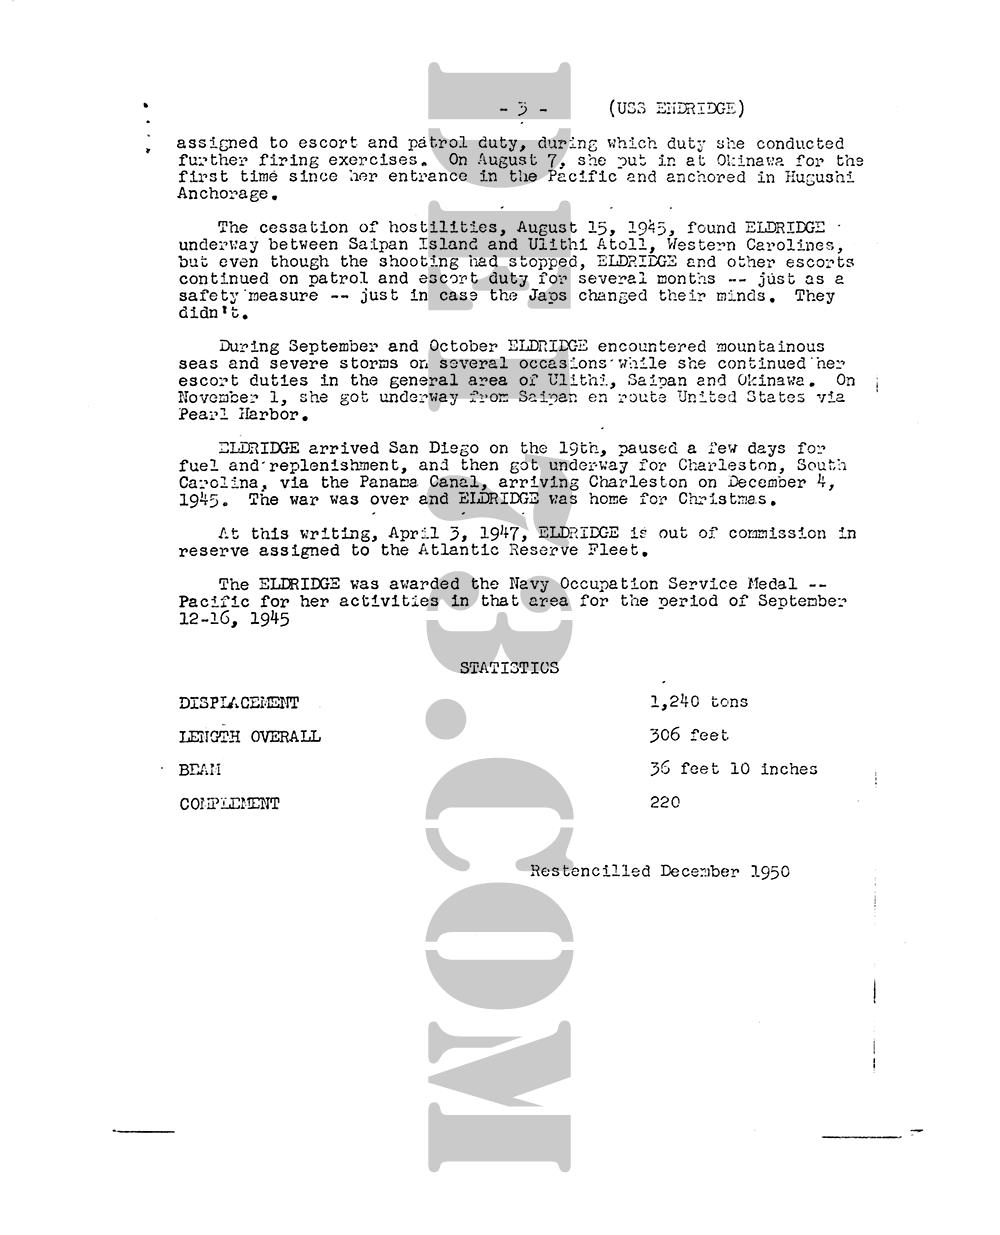 USS Eldridge Microfilm Page 003 - History